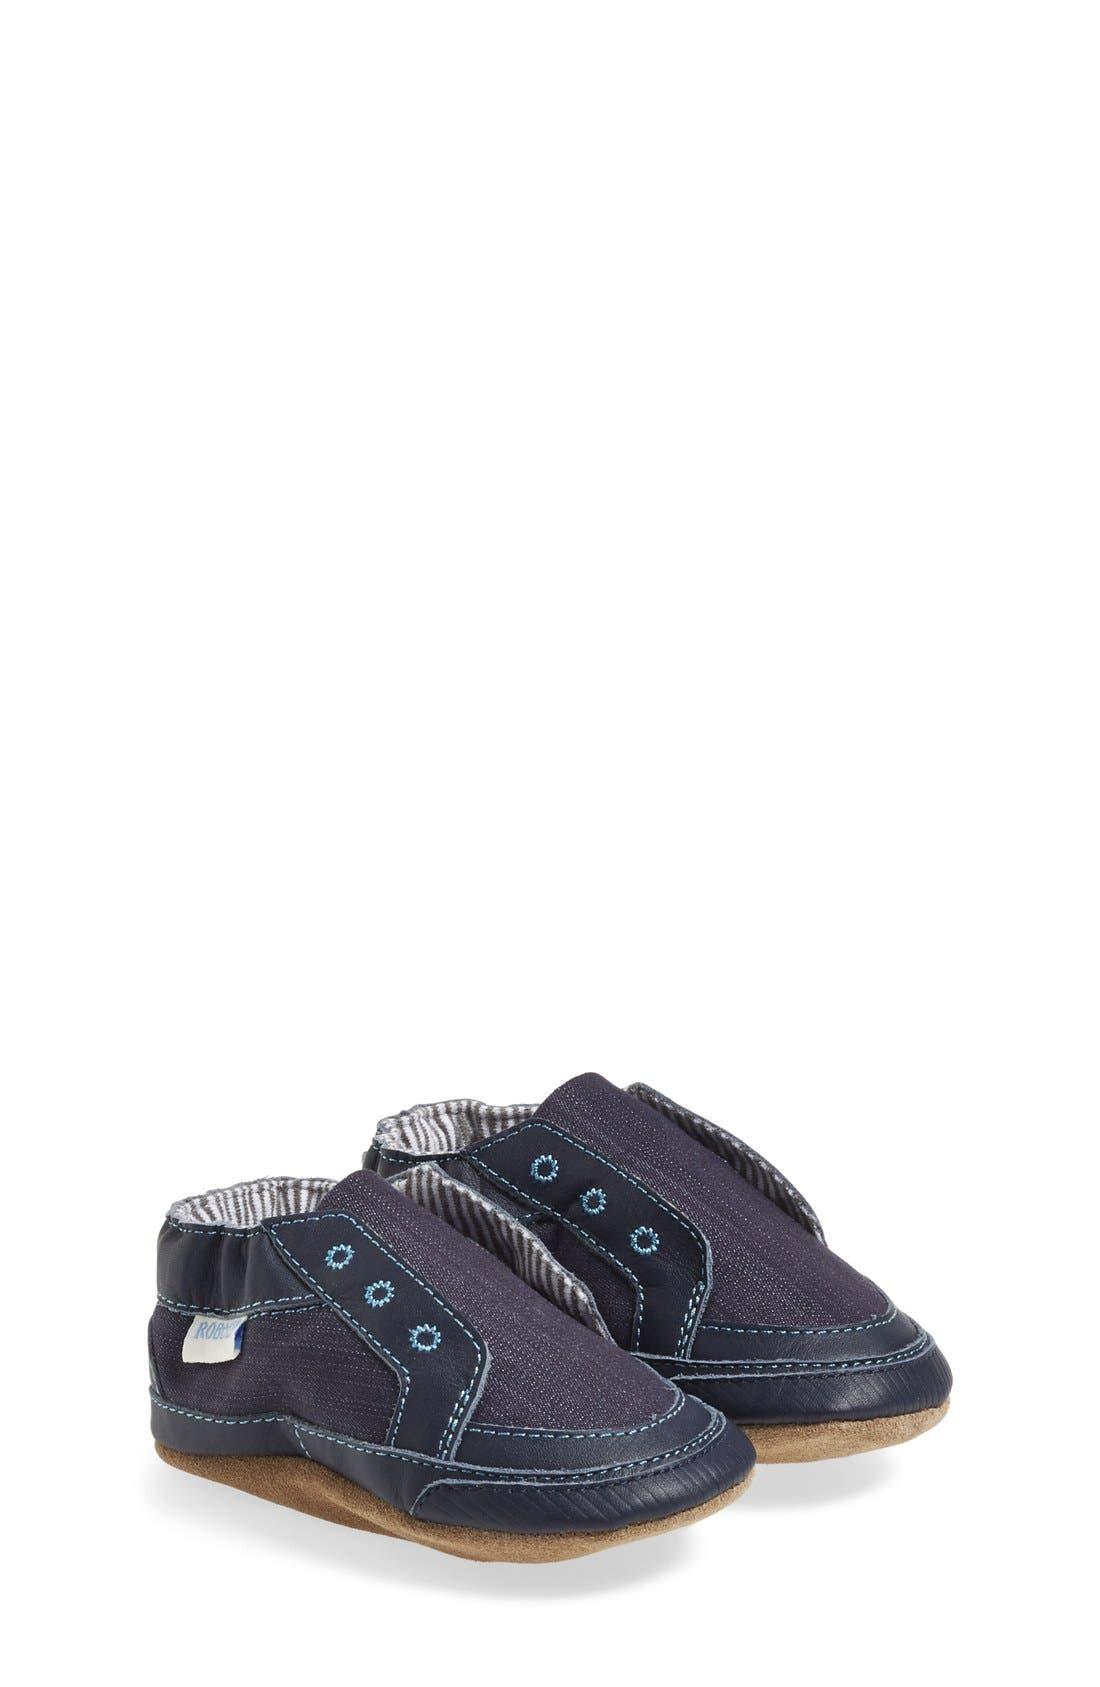 'Stylish Steve' Crib Shoe,                         Main,                         color, NAVY